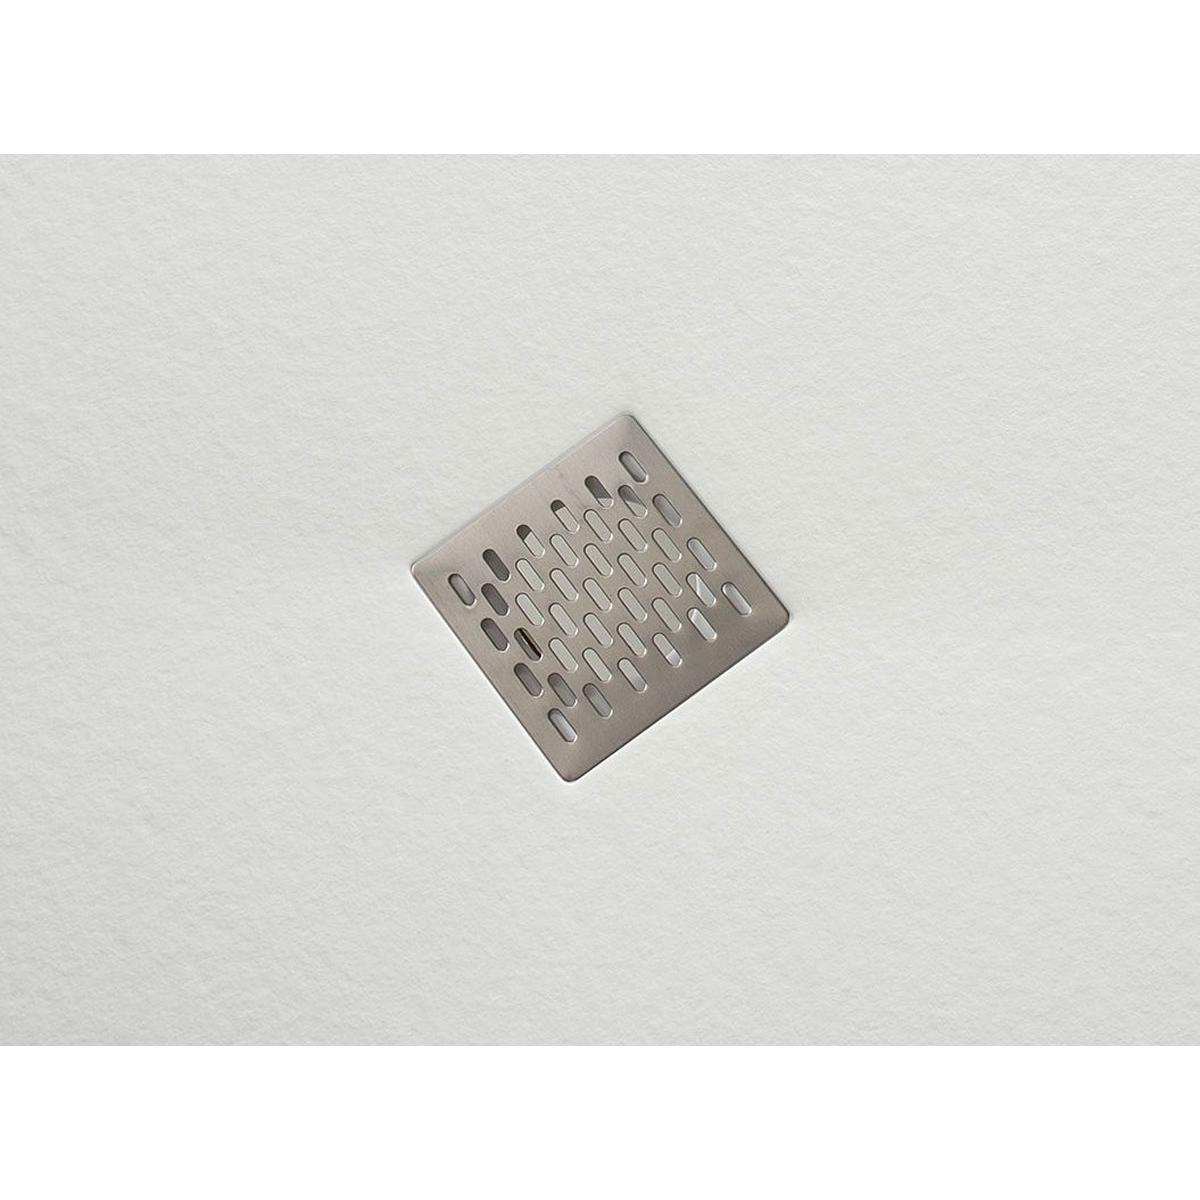 Plato de ducha rectangular 100x80 Ares Stone Nox Rectangular Blanco